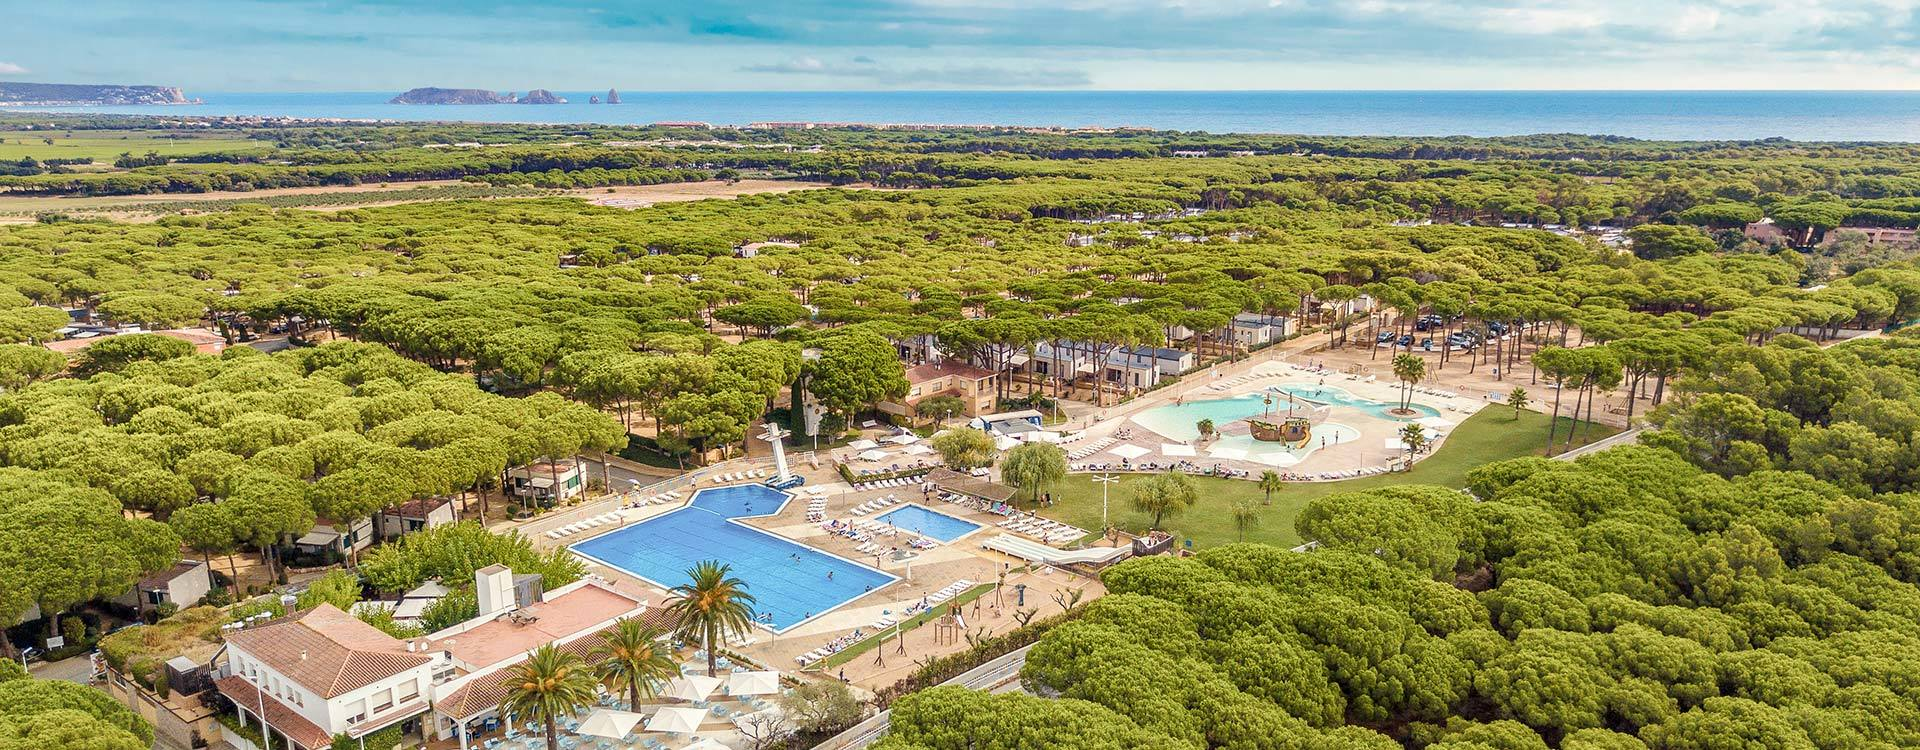 Spanje-Pals-Camping%20Sandaya%20Cypsela%20Resort-ExtraLarge Campings Spanje